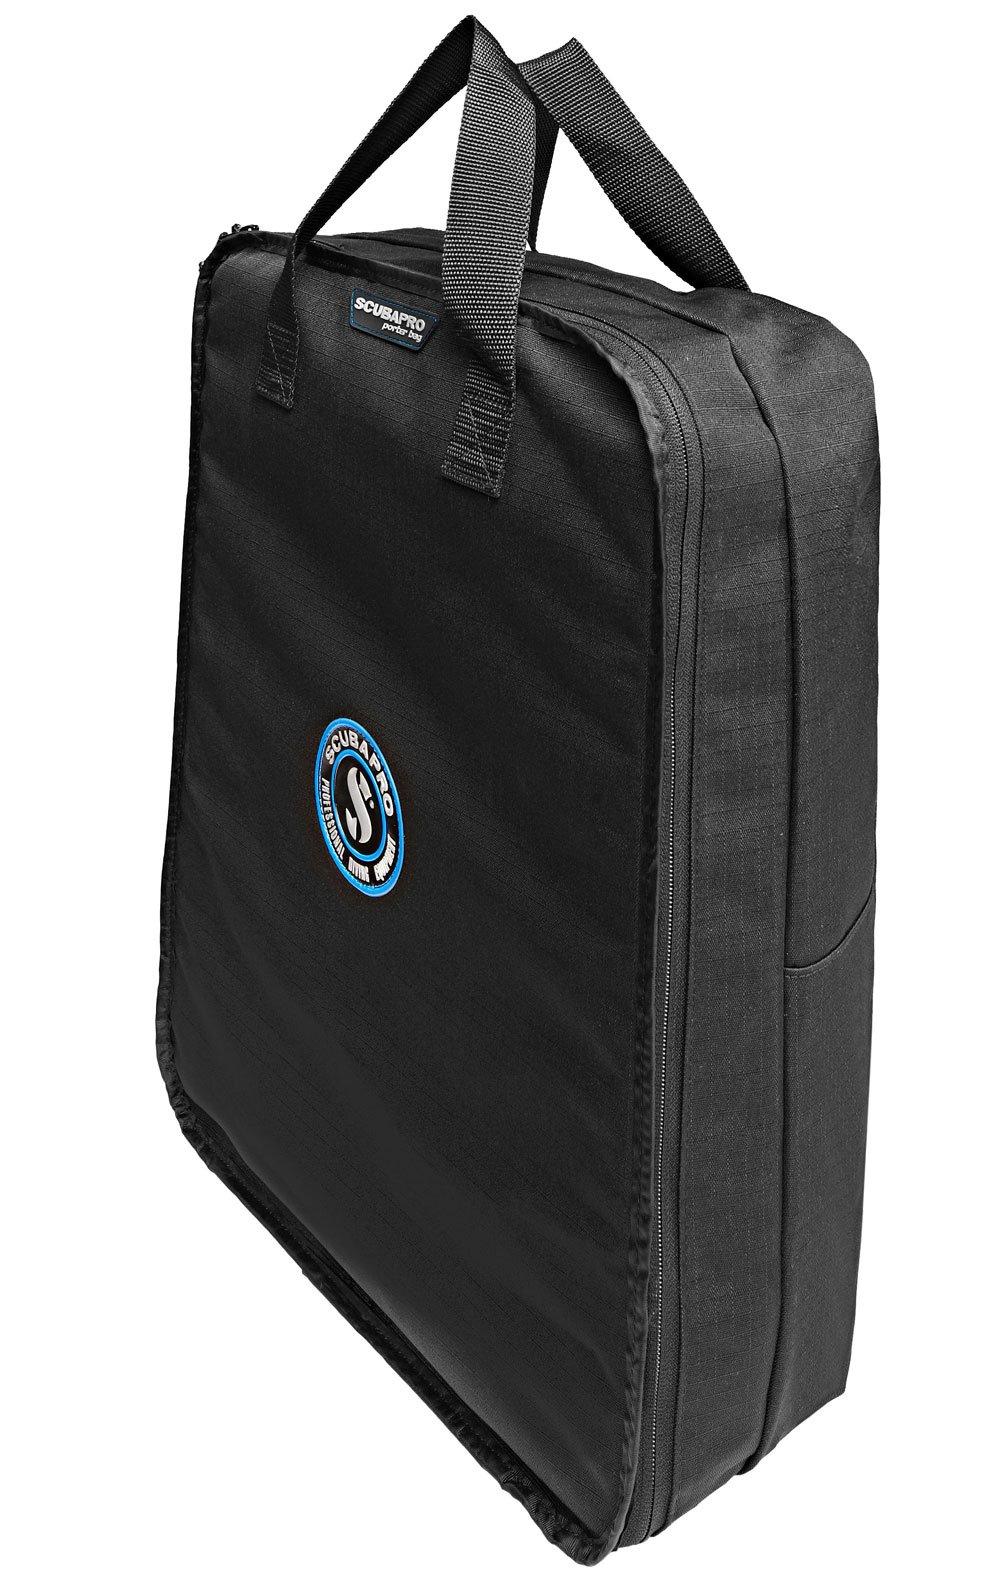 Scuba Pro Porter Bag